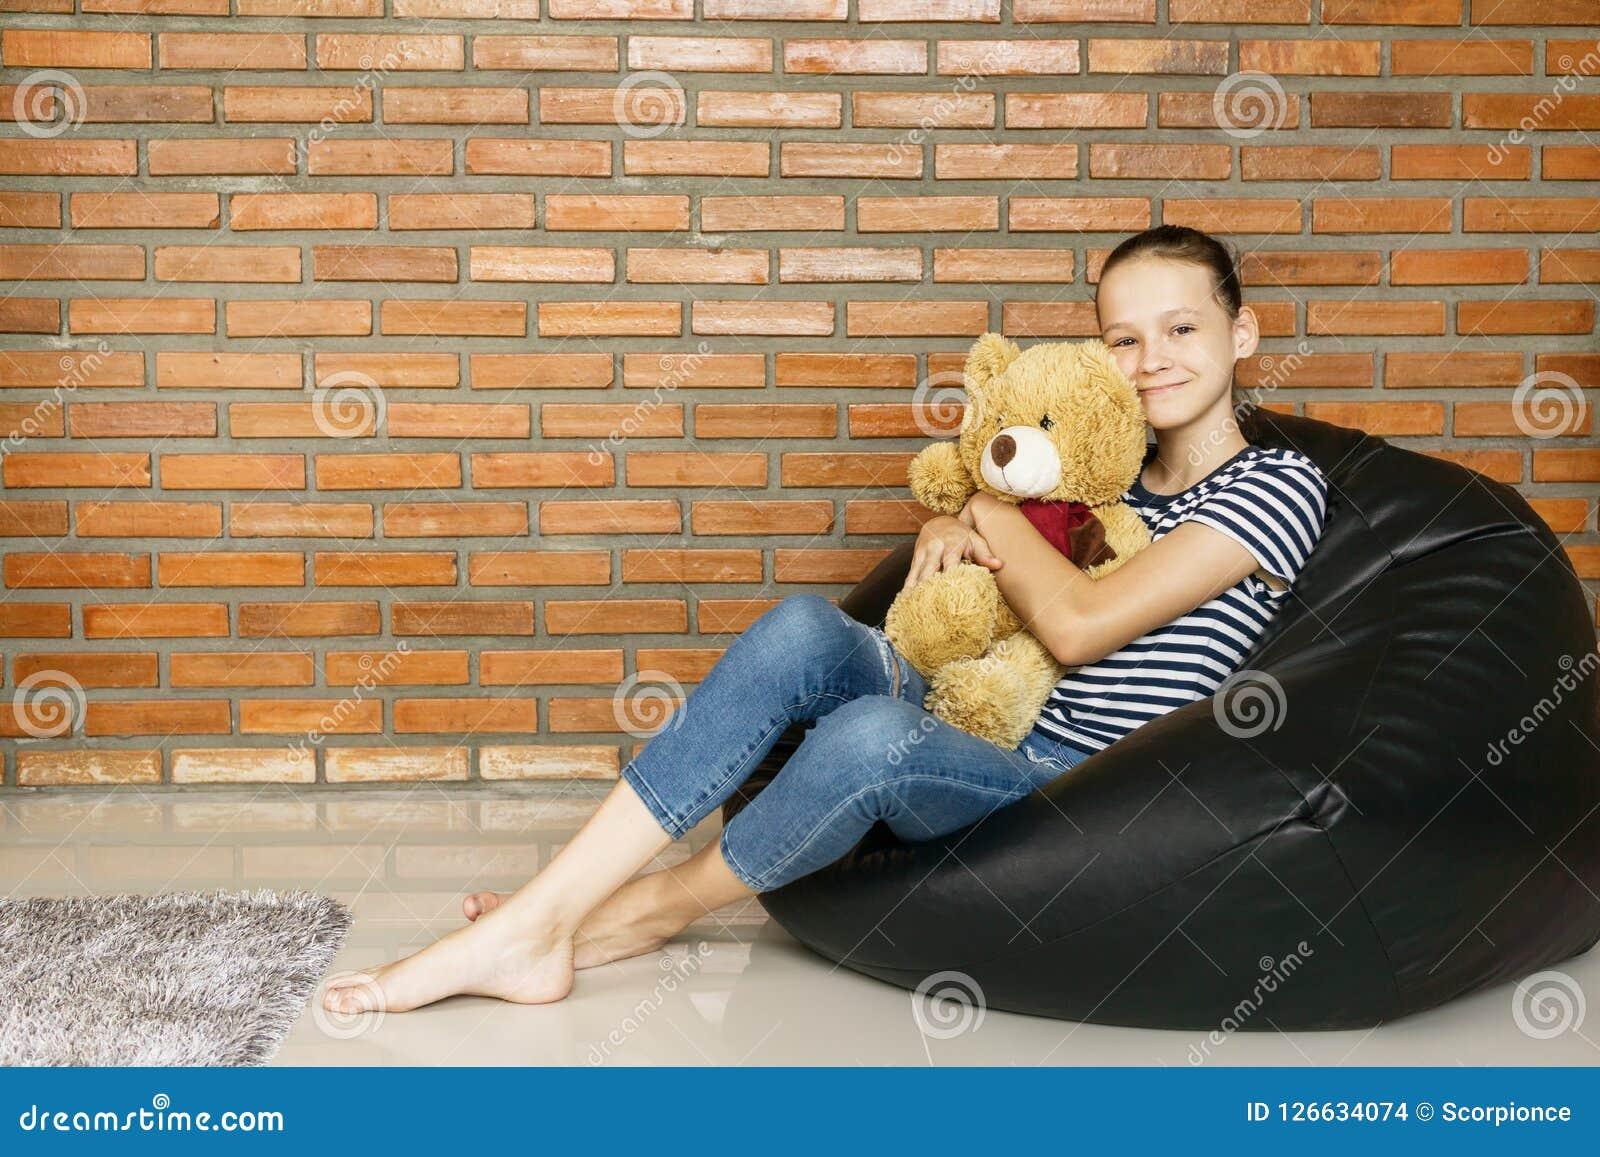 Amazing Menina Adolescente Caucasiano Bonita Que Senta Se Na Cadeira Gmtry Best Dining Table And Chair Ideas Images Gmtryco